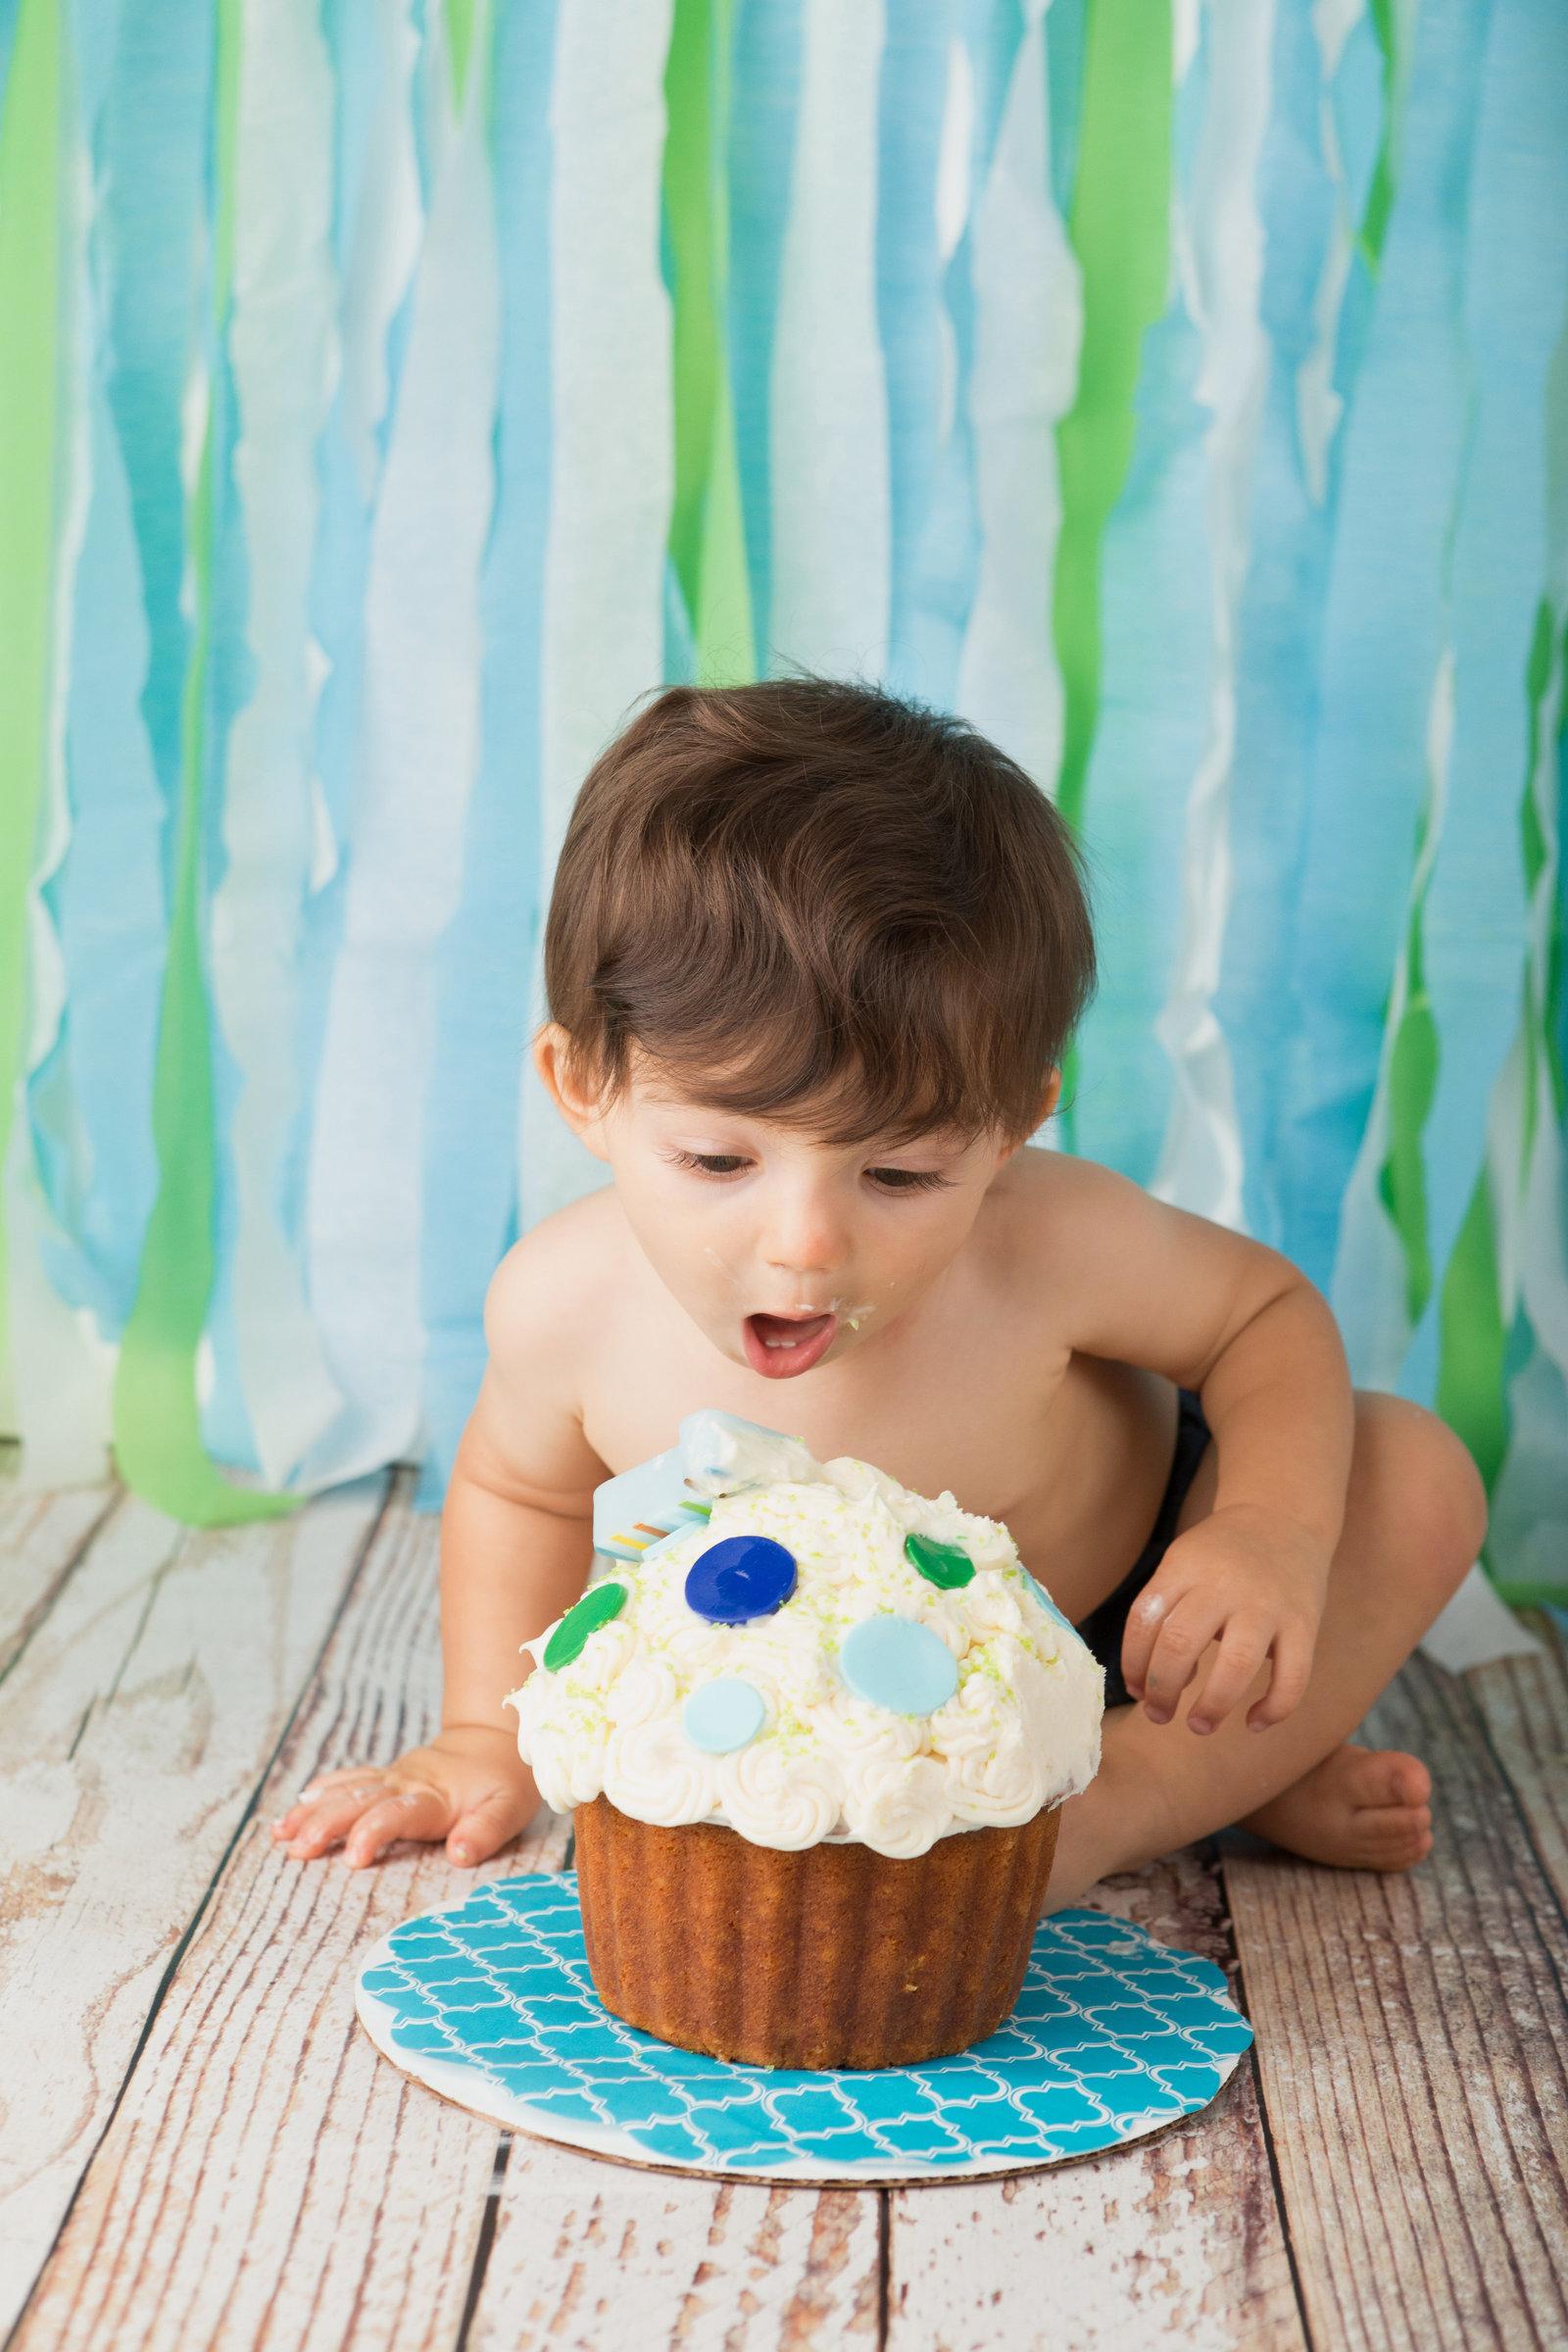 First birthday cake smash professional photos by Hudson Valley NY photographer Cornwall photo studio